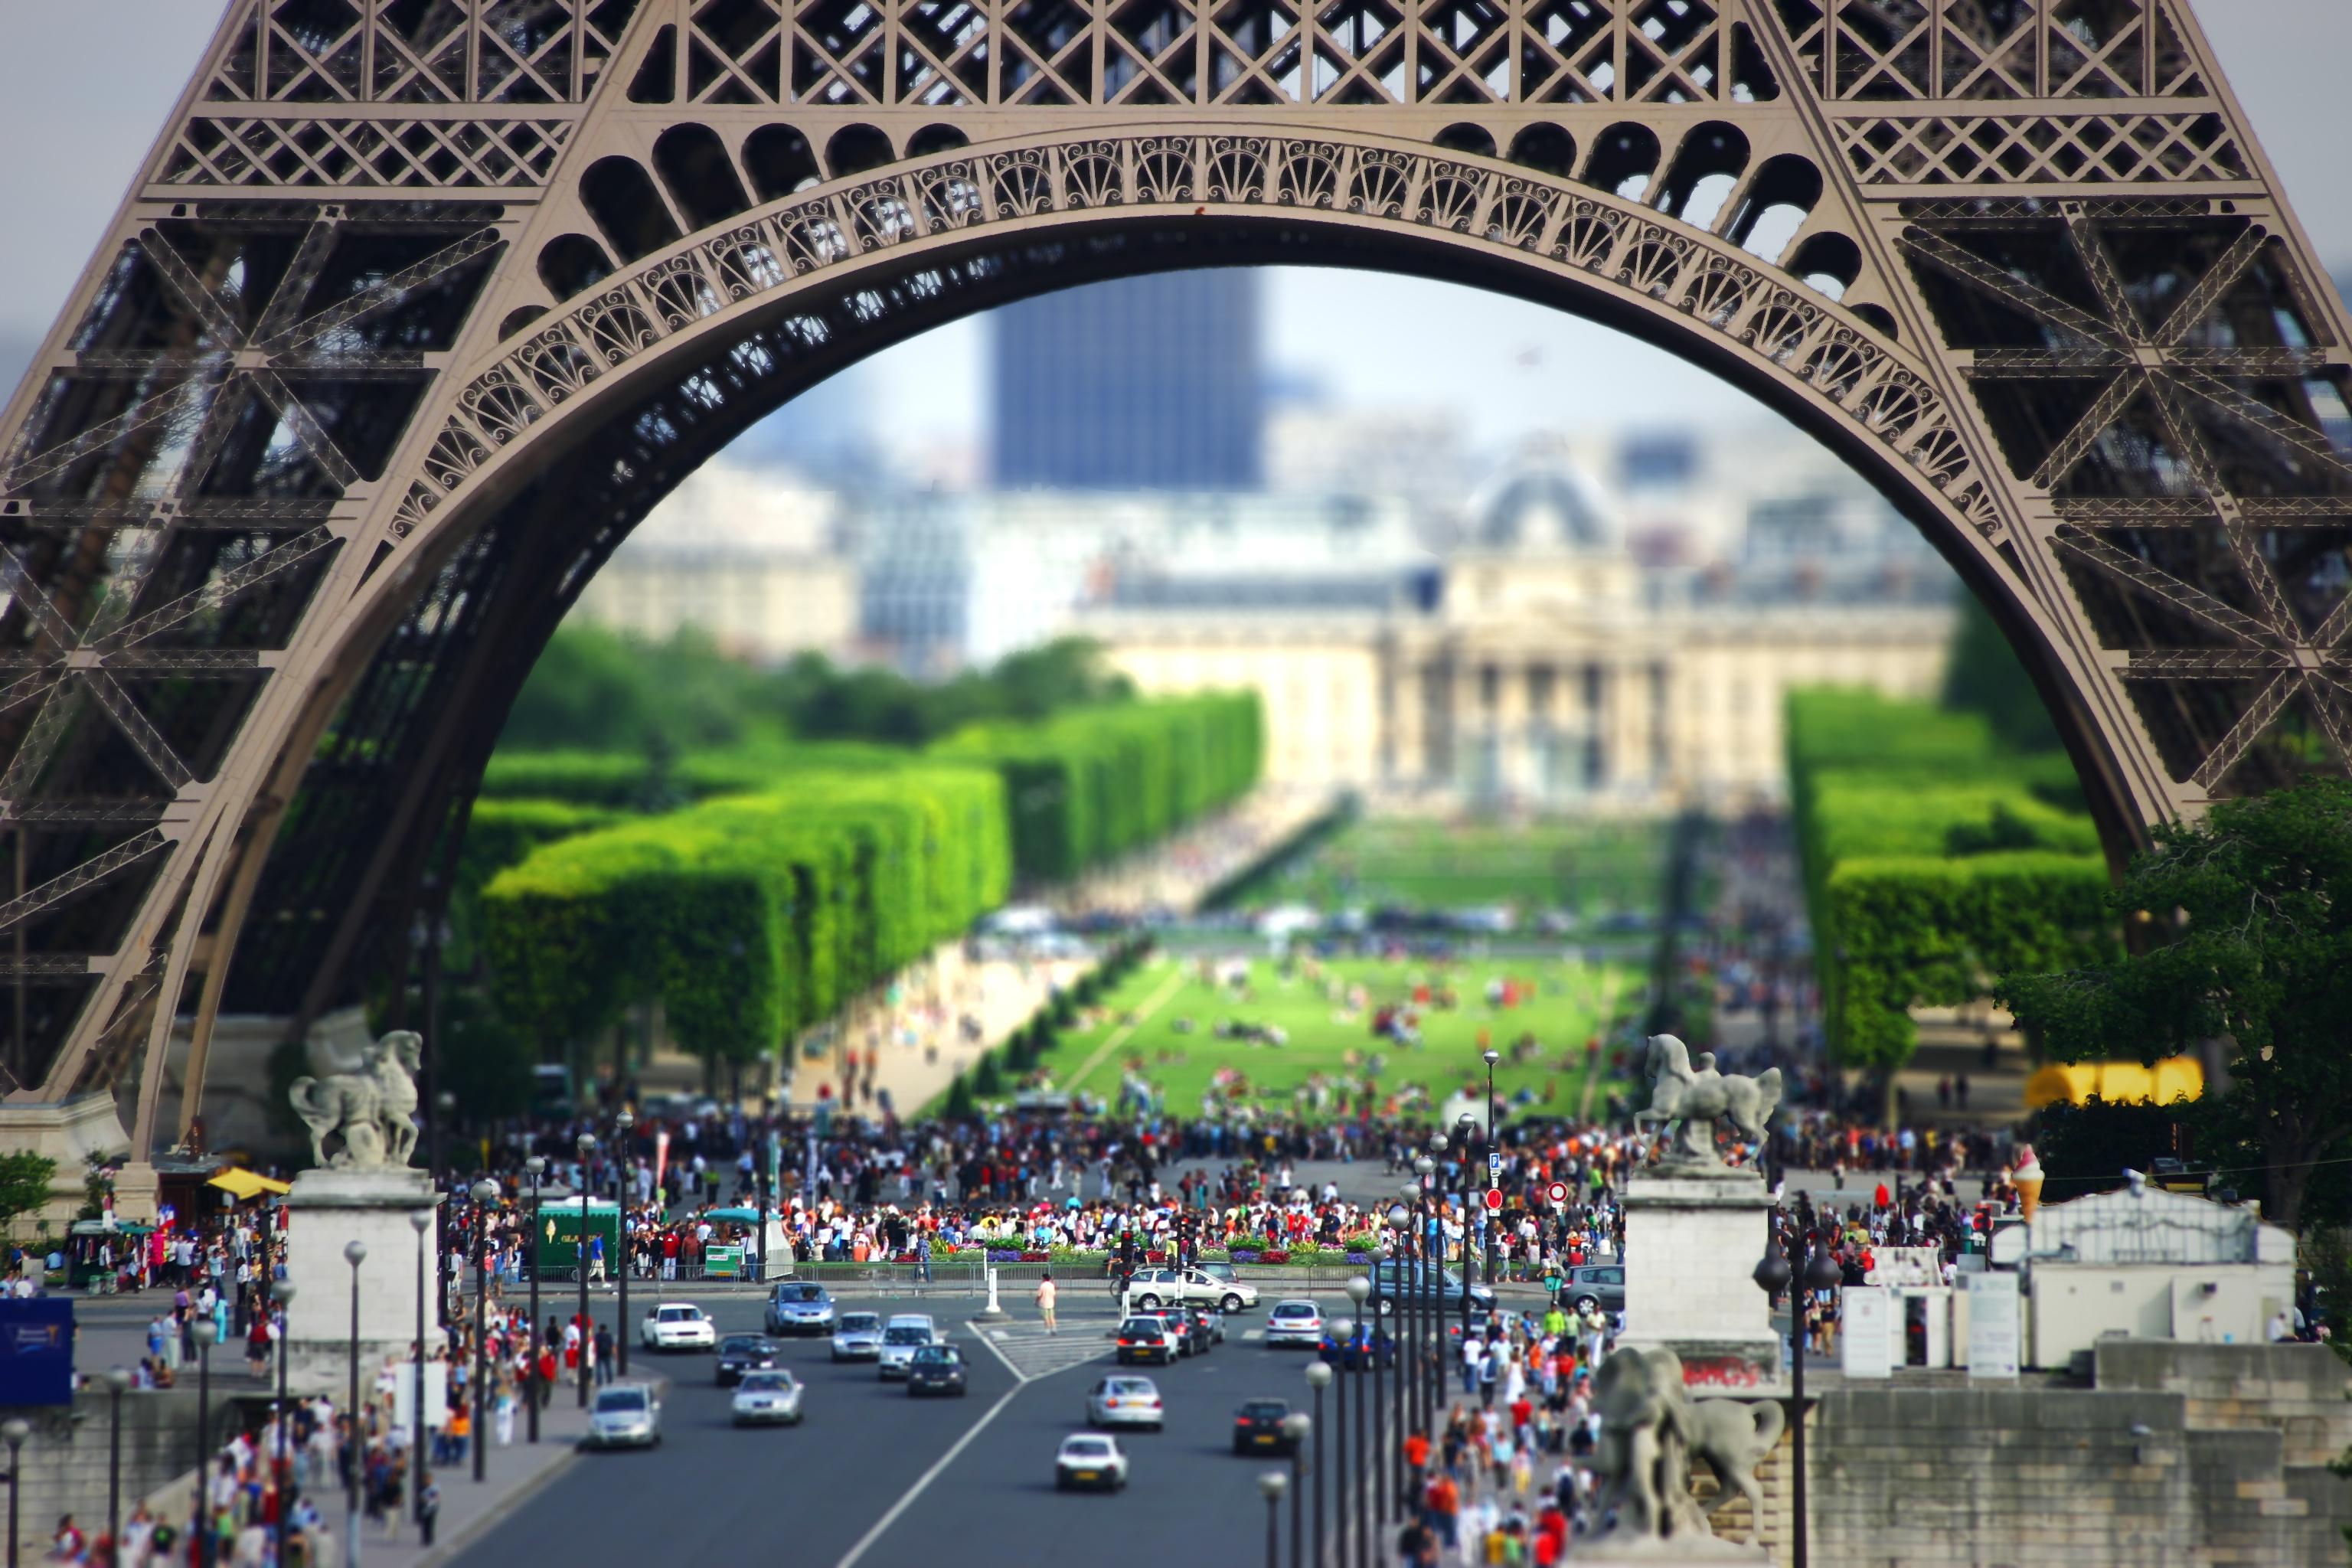 General 3072x2048 France Paris Eiffel Tower tilt shift people traffic cityscape